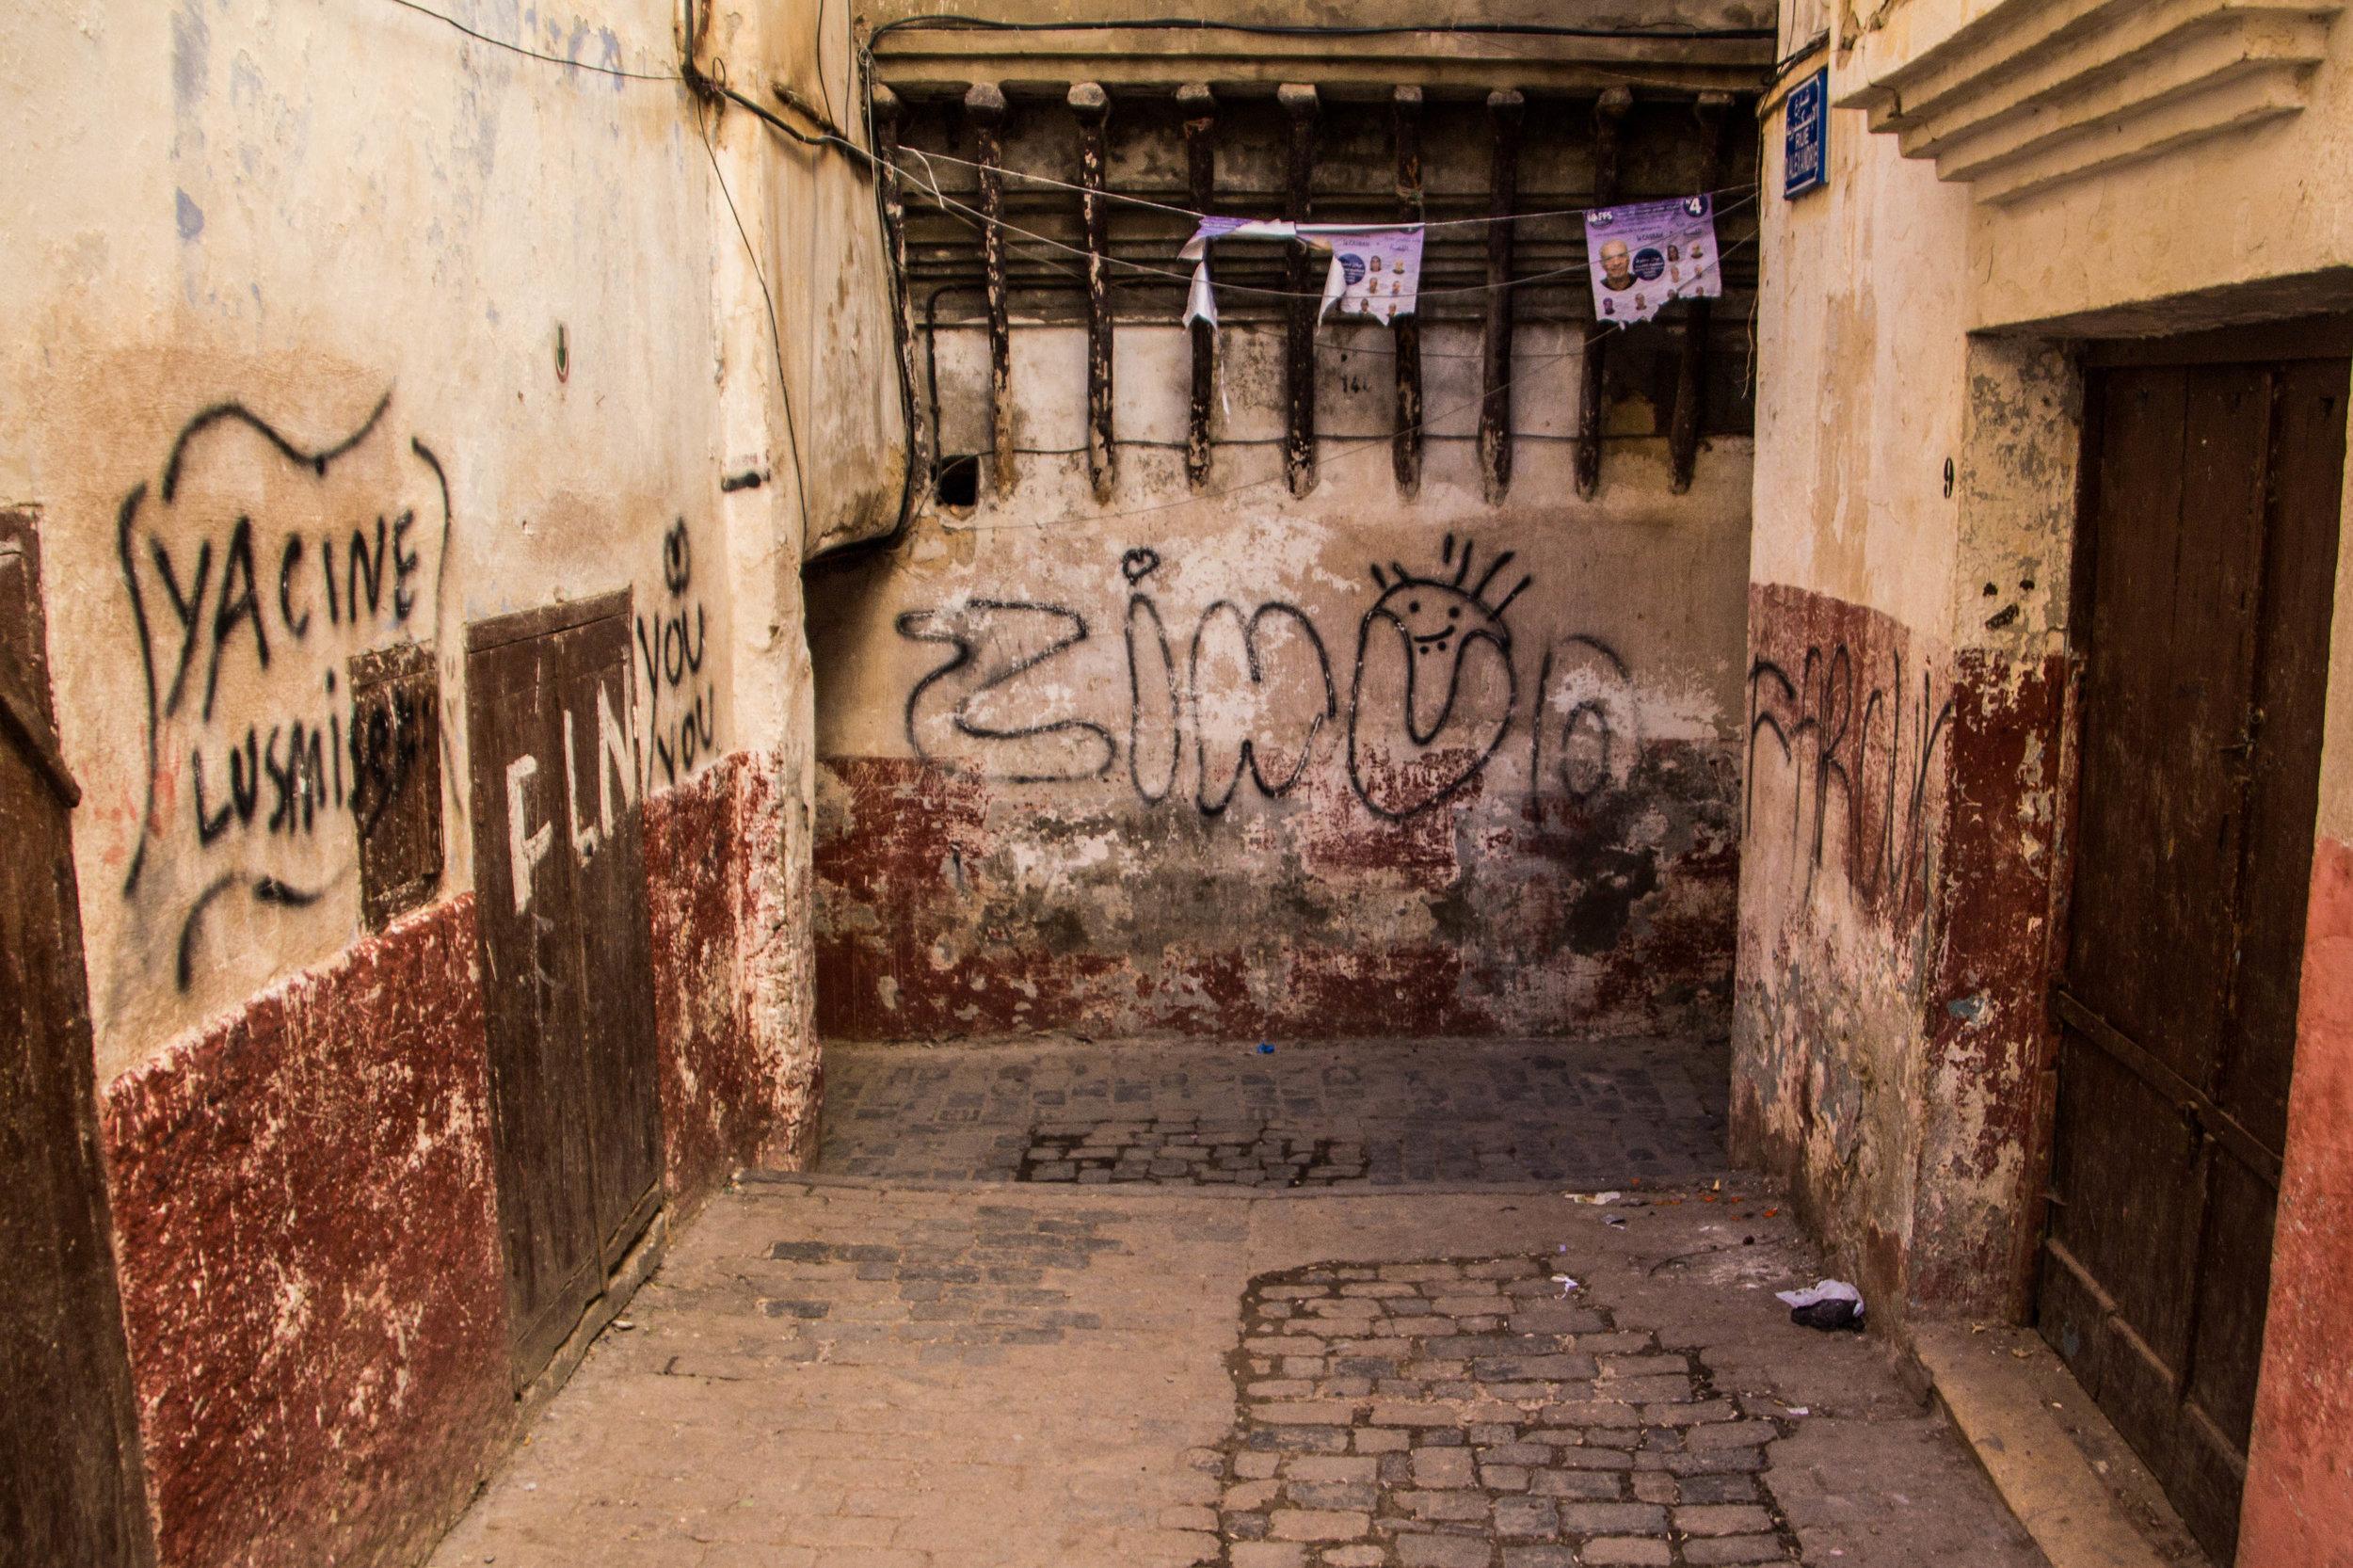 casbah-photography-algiers-algeria-alger-7.jpg